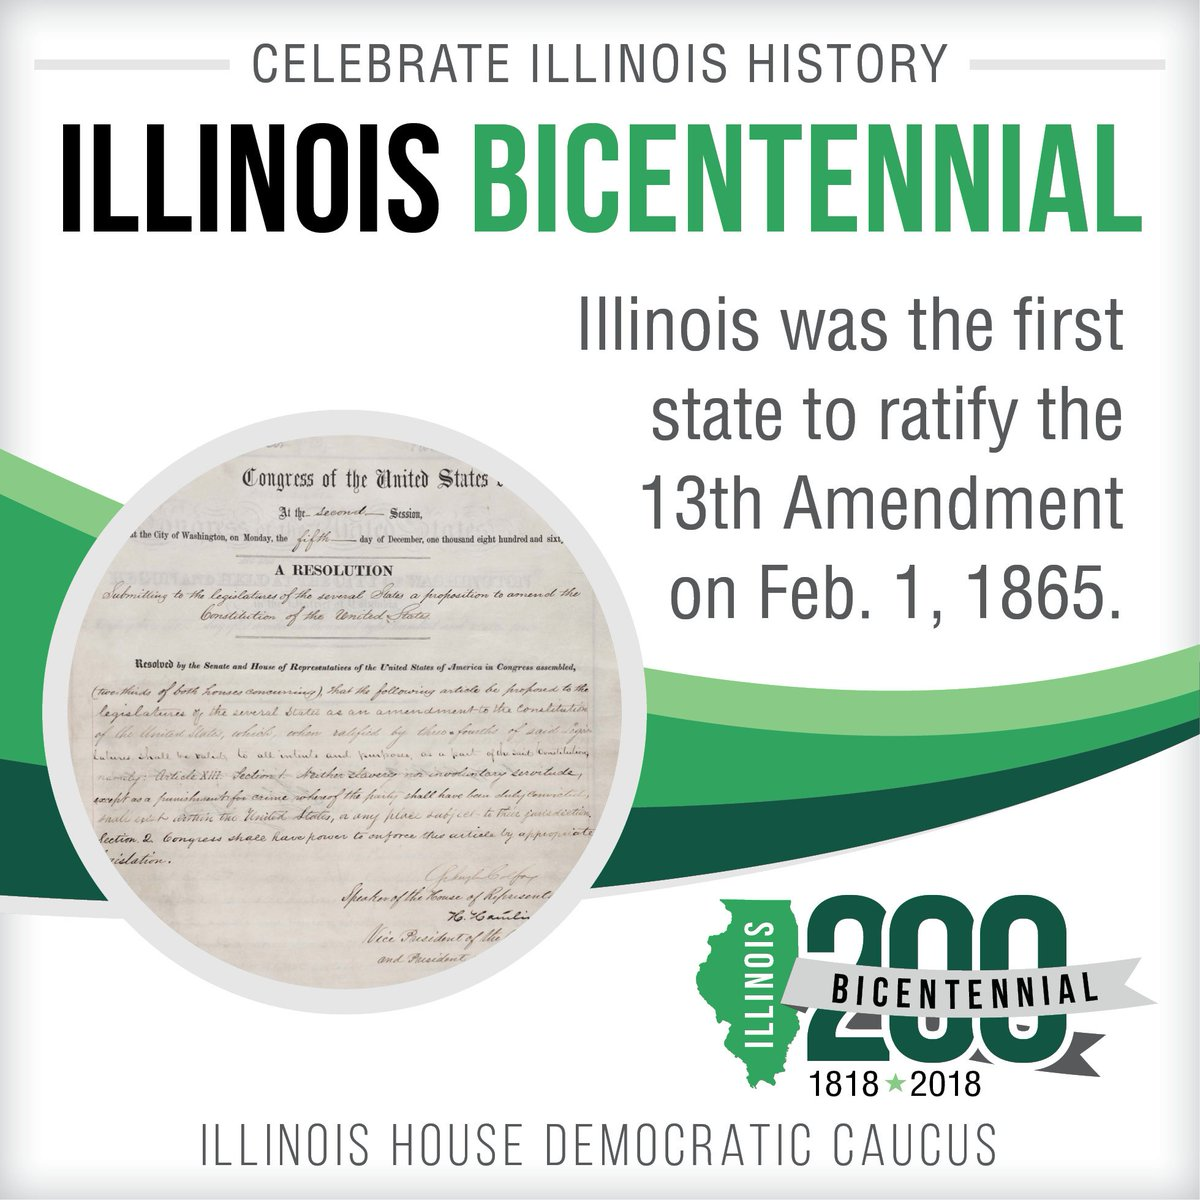 test Twitter Media - Did you know that the Thirteenth Amendment, which abolished slavery, was written by U.S. Senator Lyman Trumbull from Alton, Illinois? #Celebrate200 #IllinoisProud https://t.co/x4YMVq5rJd